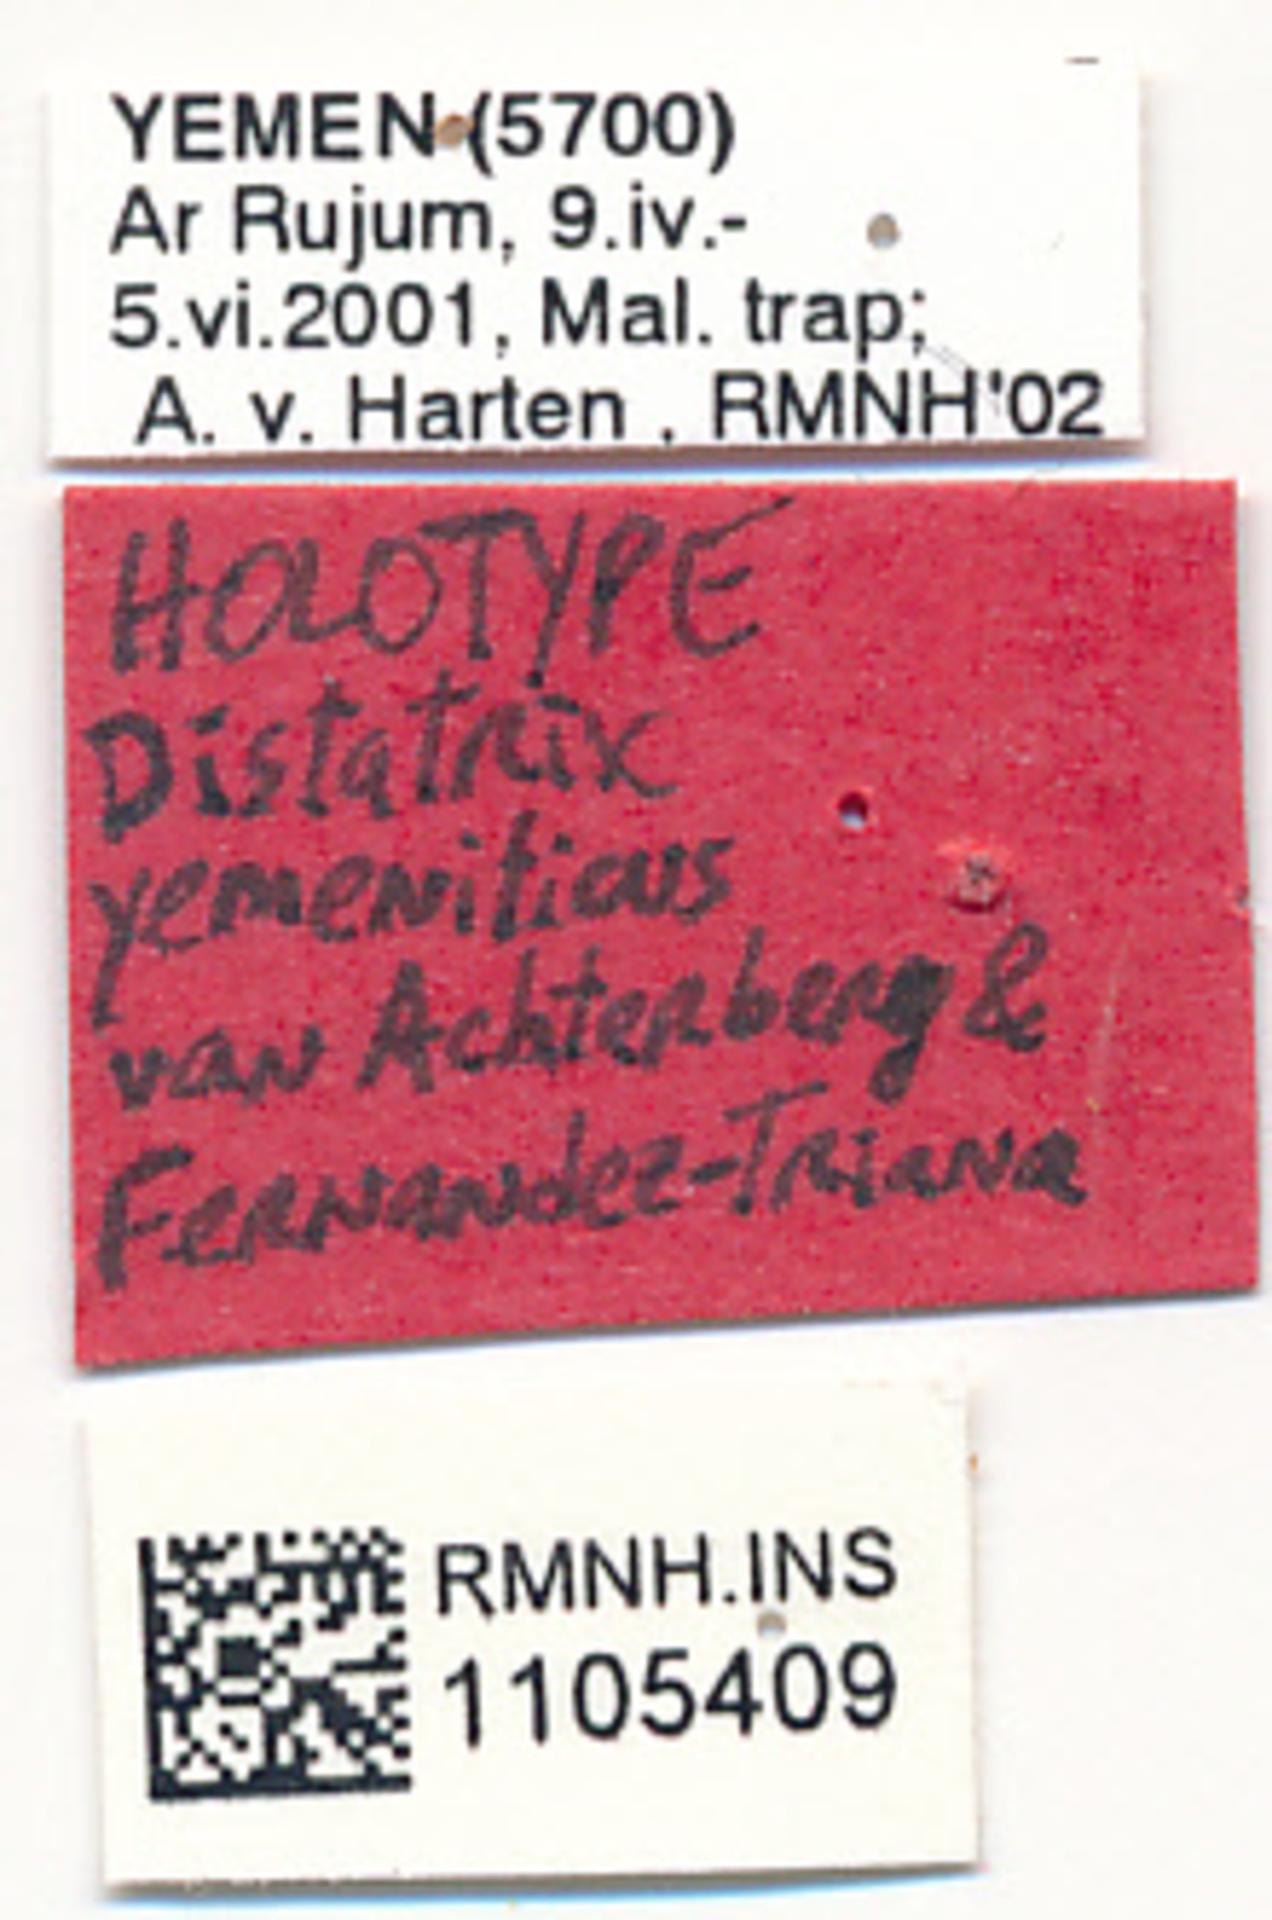 RMNH.INS.1105409 | Distatrix yemeniticus van Achterberg & Fernandez-Triana, 2017